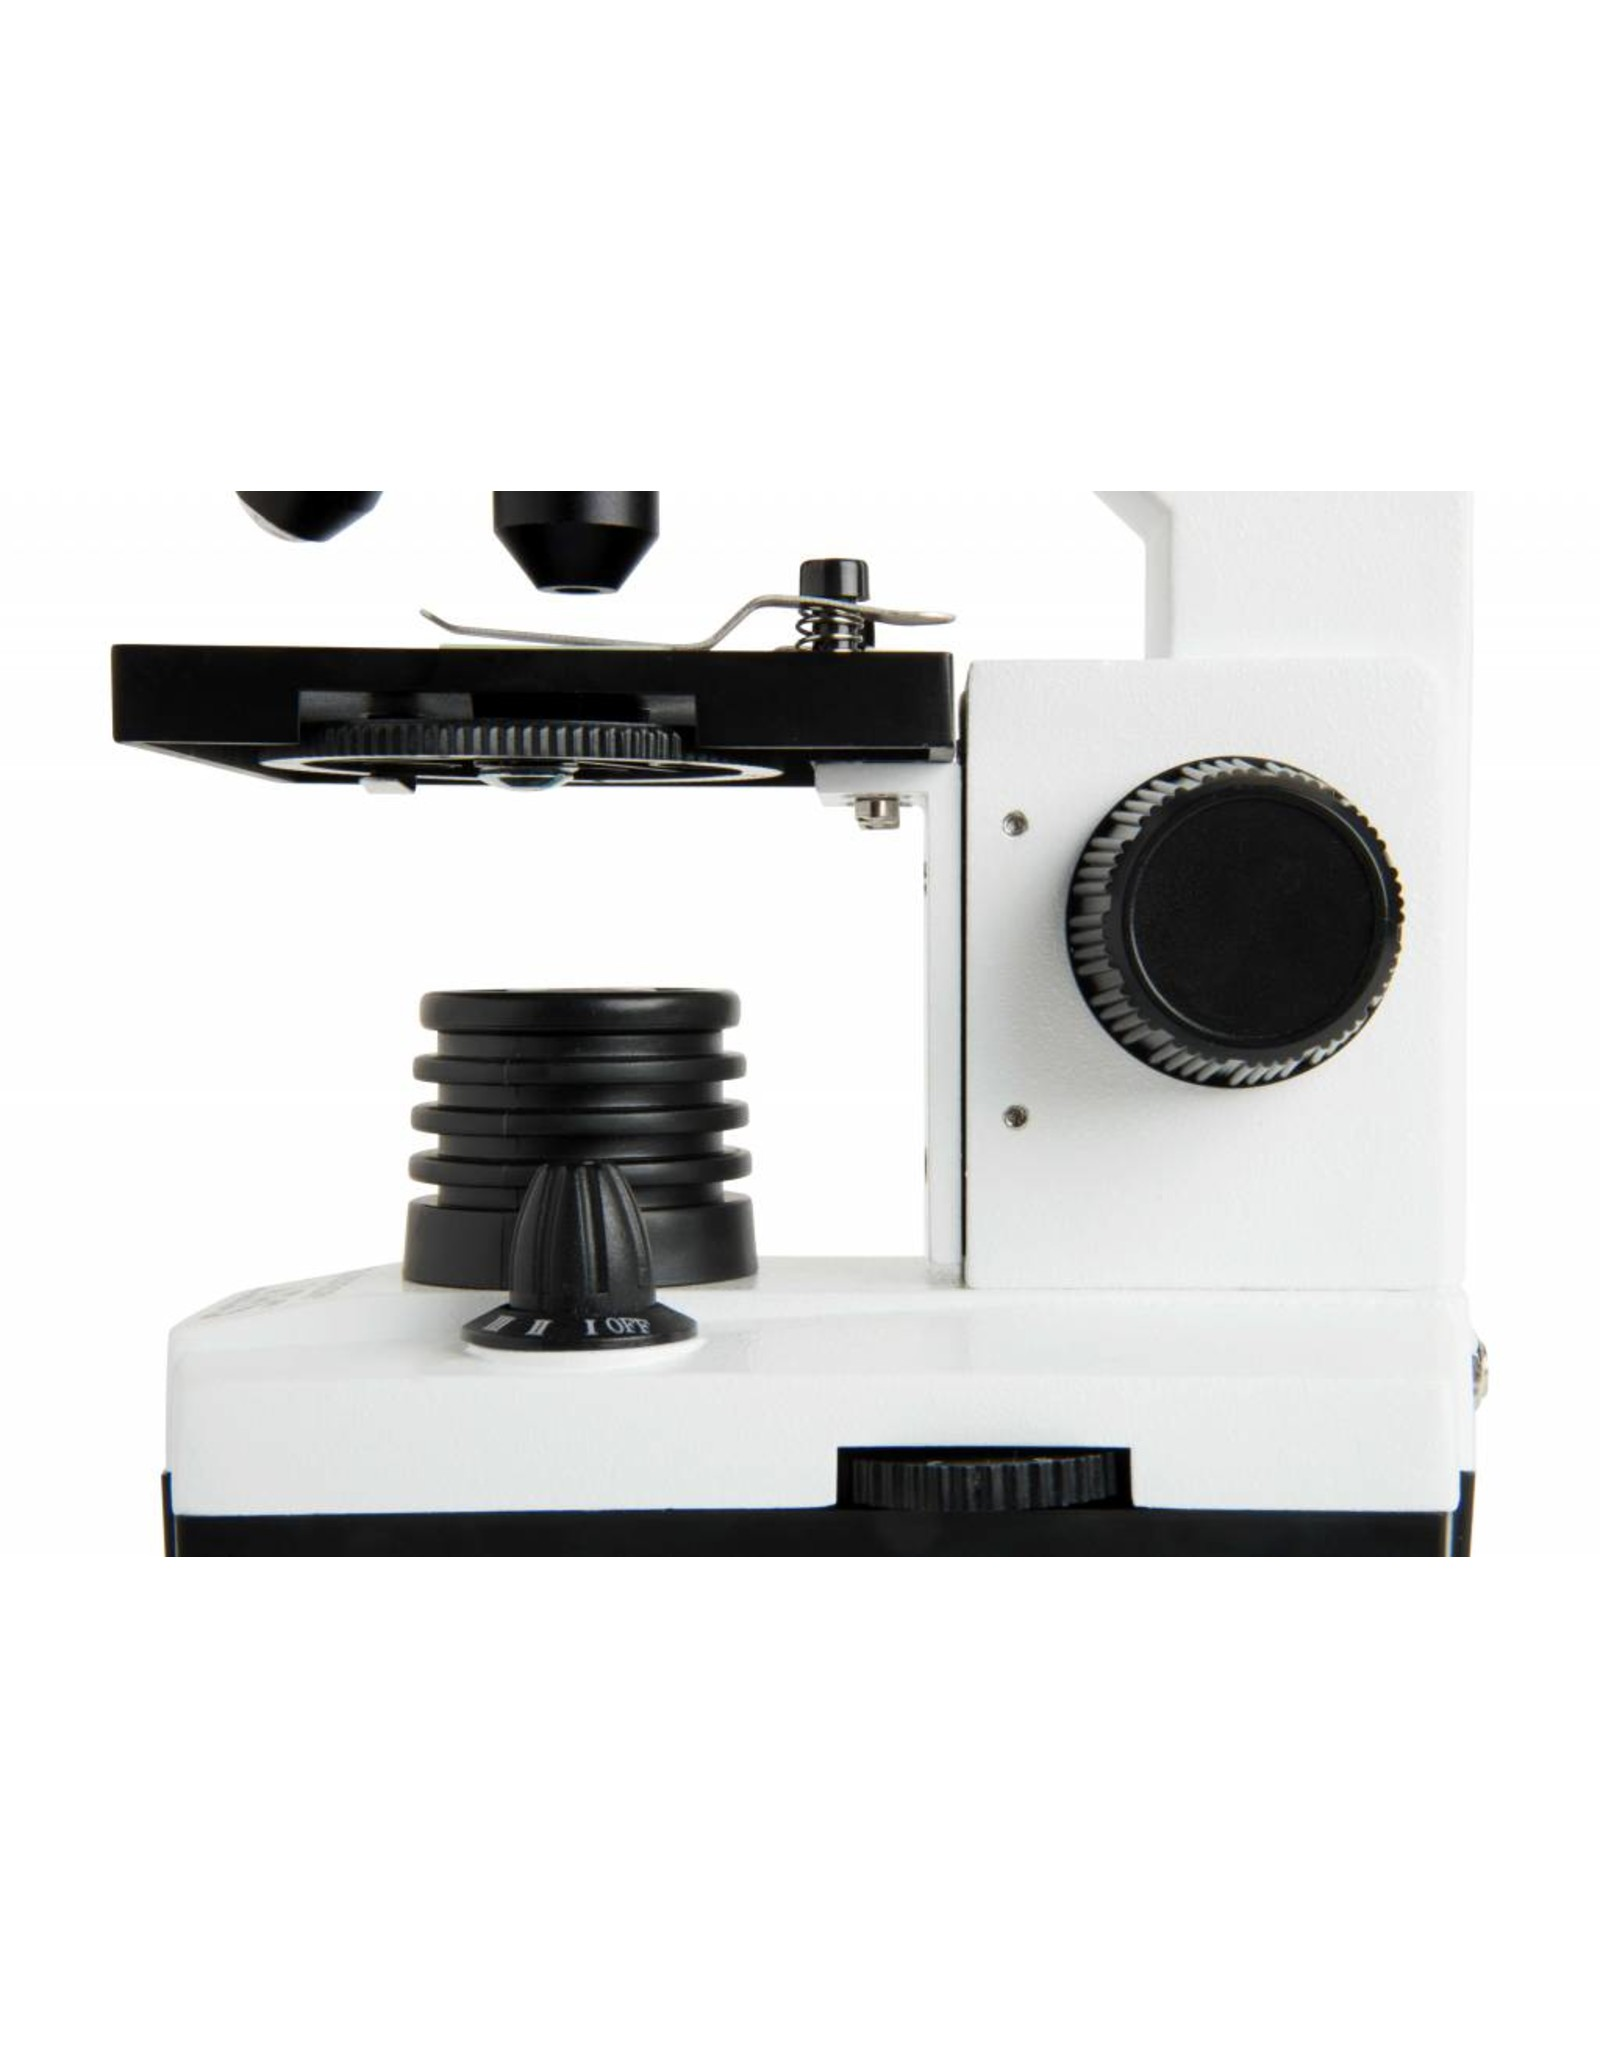 Celestron Celestron Labs CM800 Compound Microscope